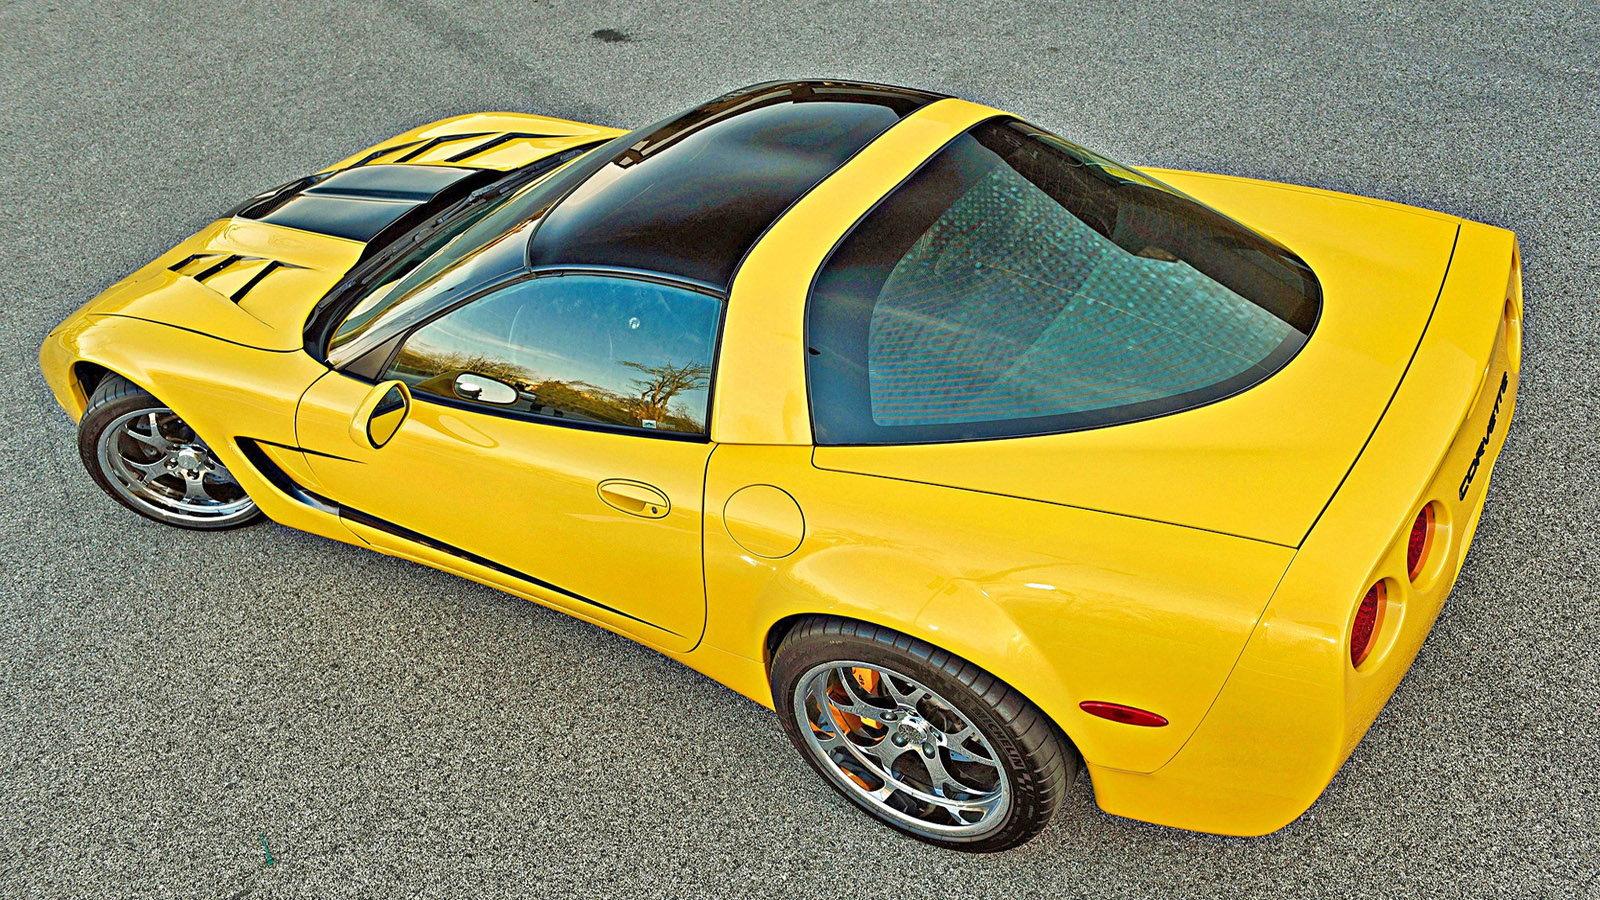 2003 Widebody C5 in Millennium Yellow Goes Quick